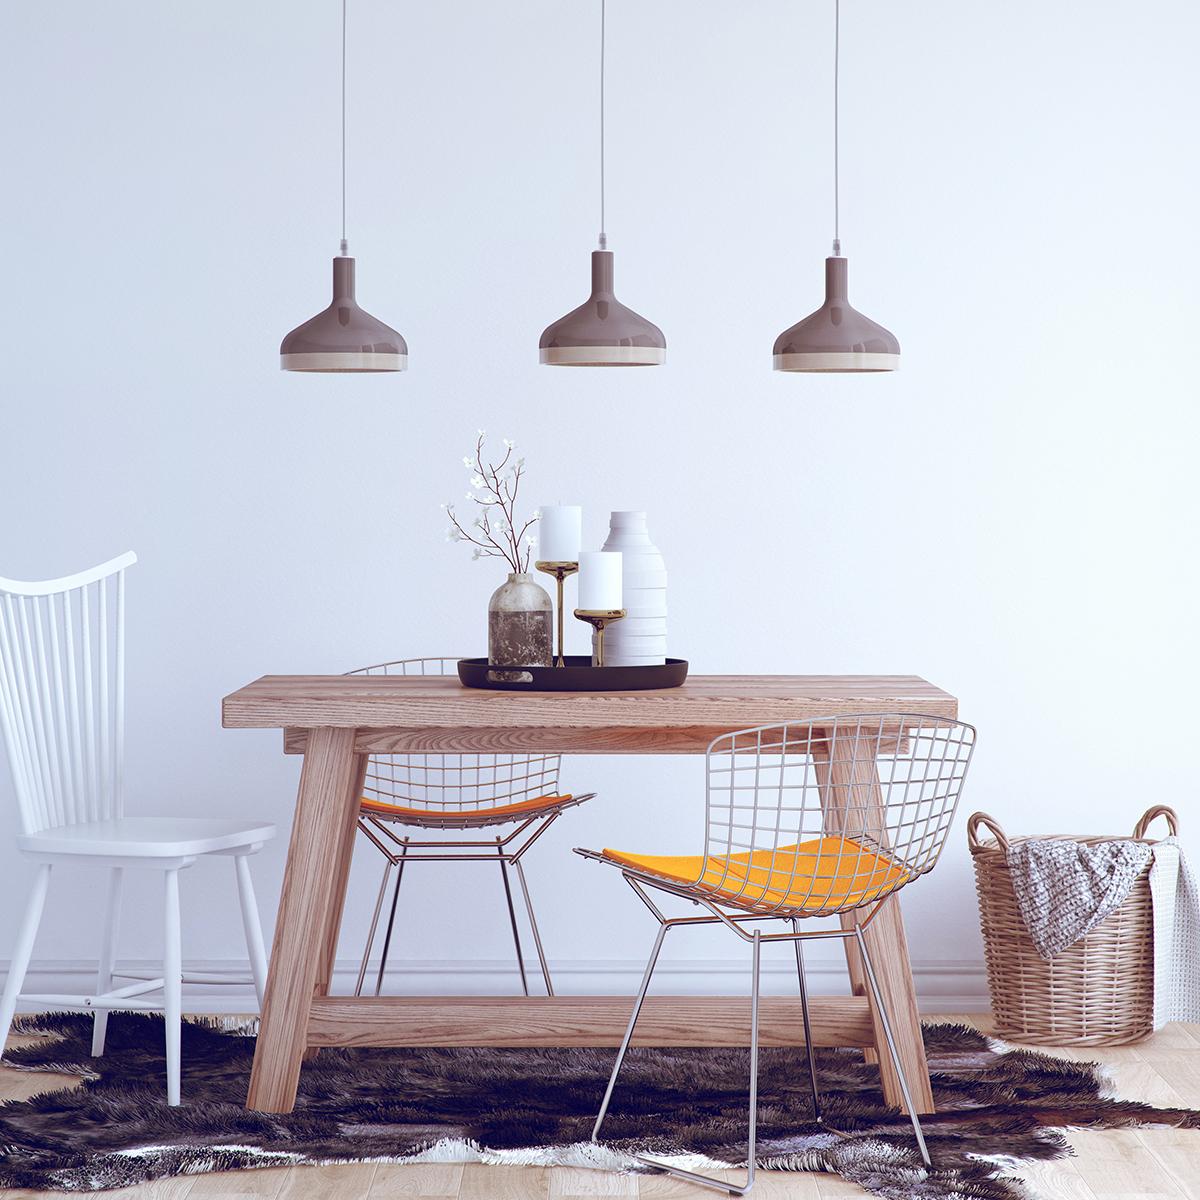 Plera Lamp by Enrico Zanolla - 07